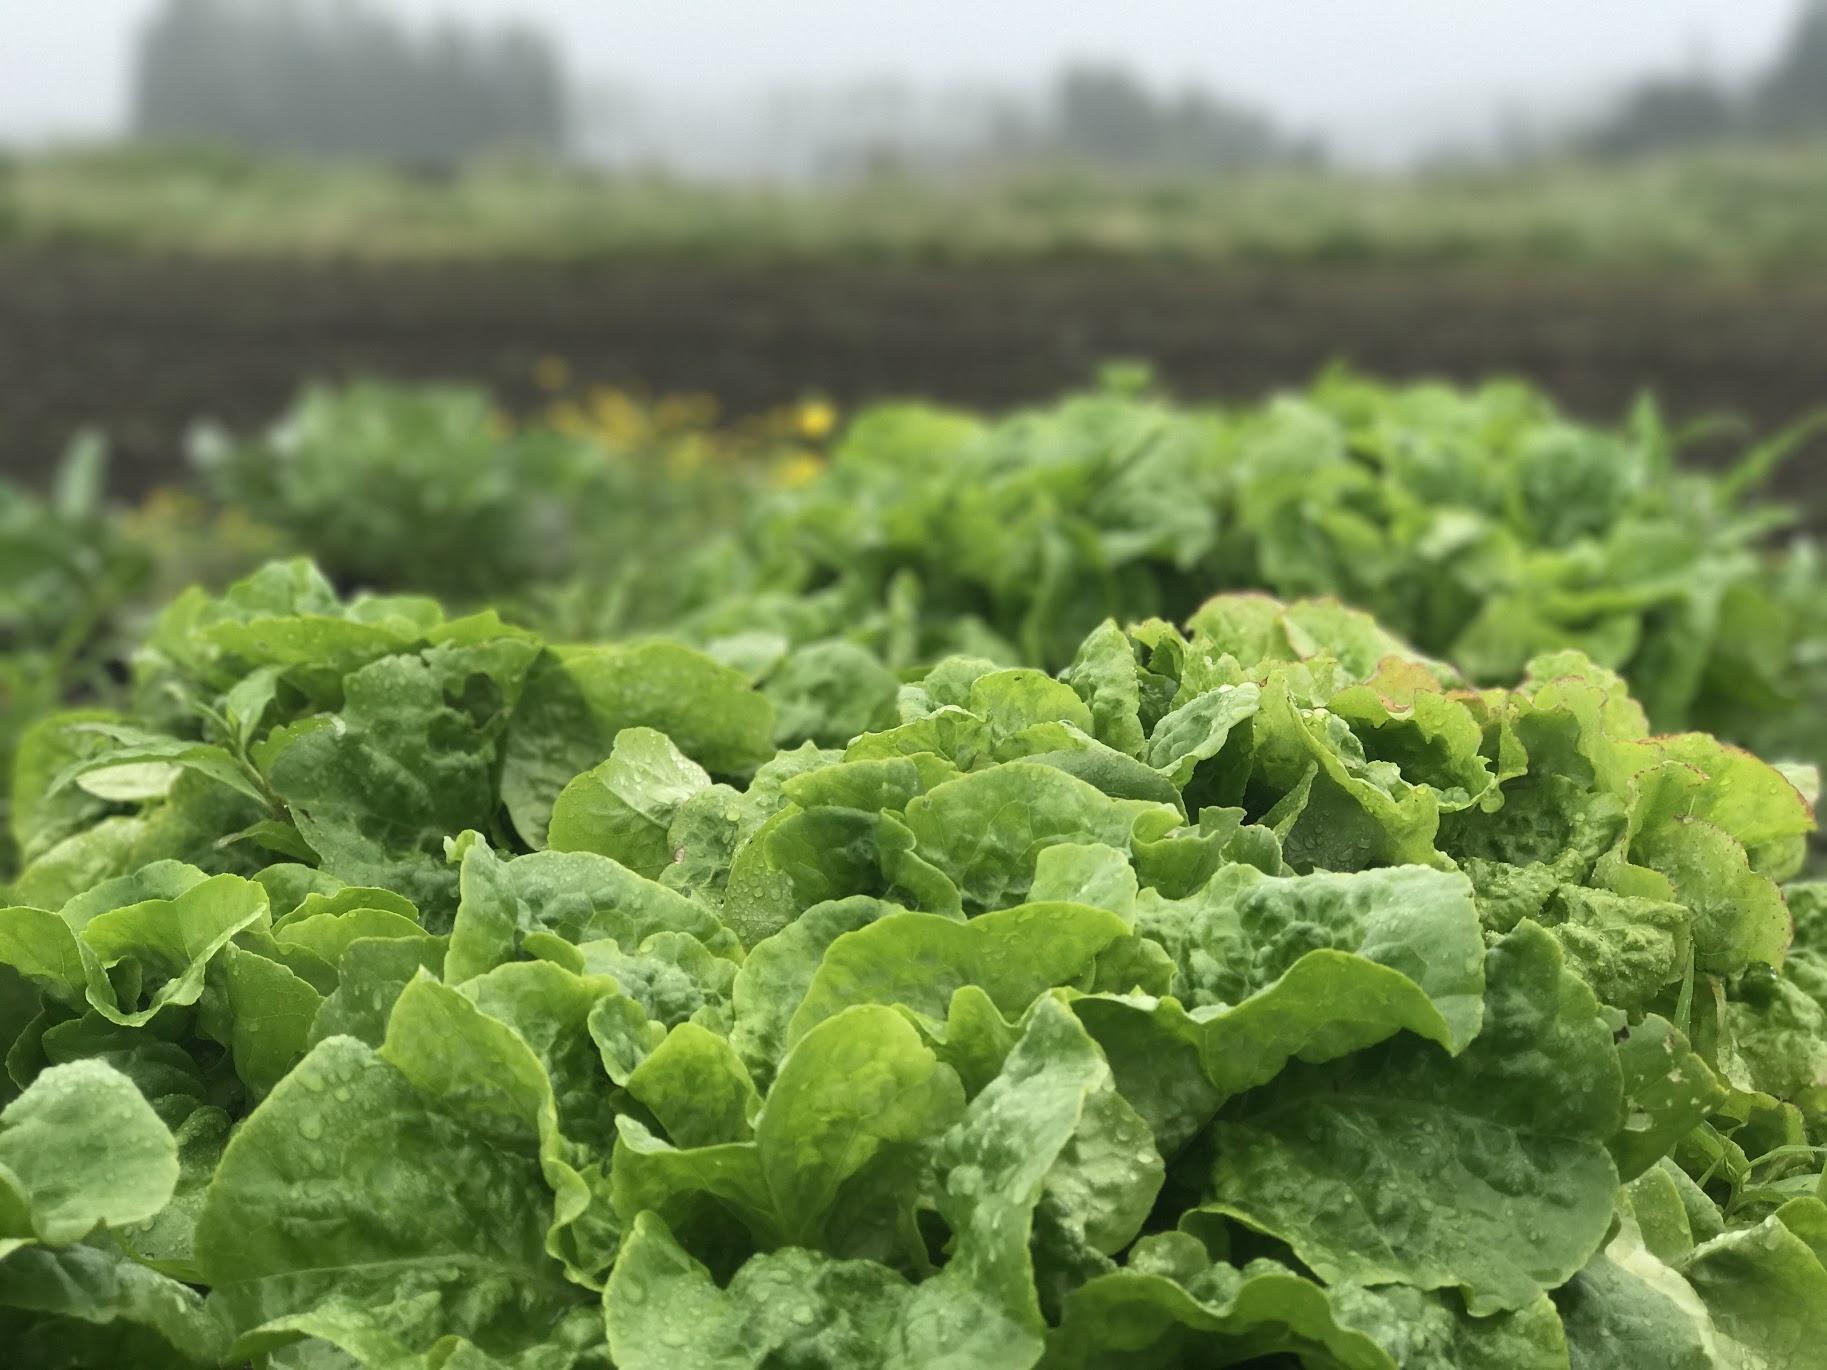 Bibb Lettuce - A sweet, crunchy head lettuce. Great for lettuce wraps or a mild salad.